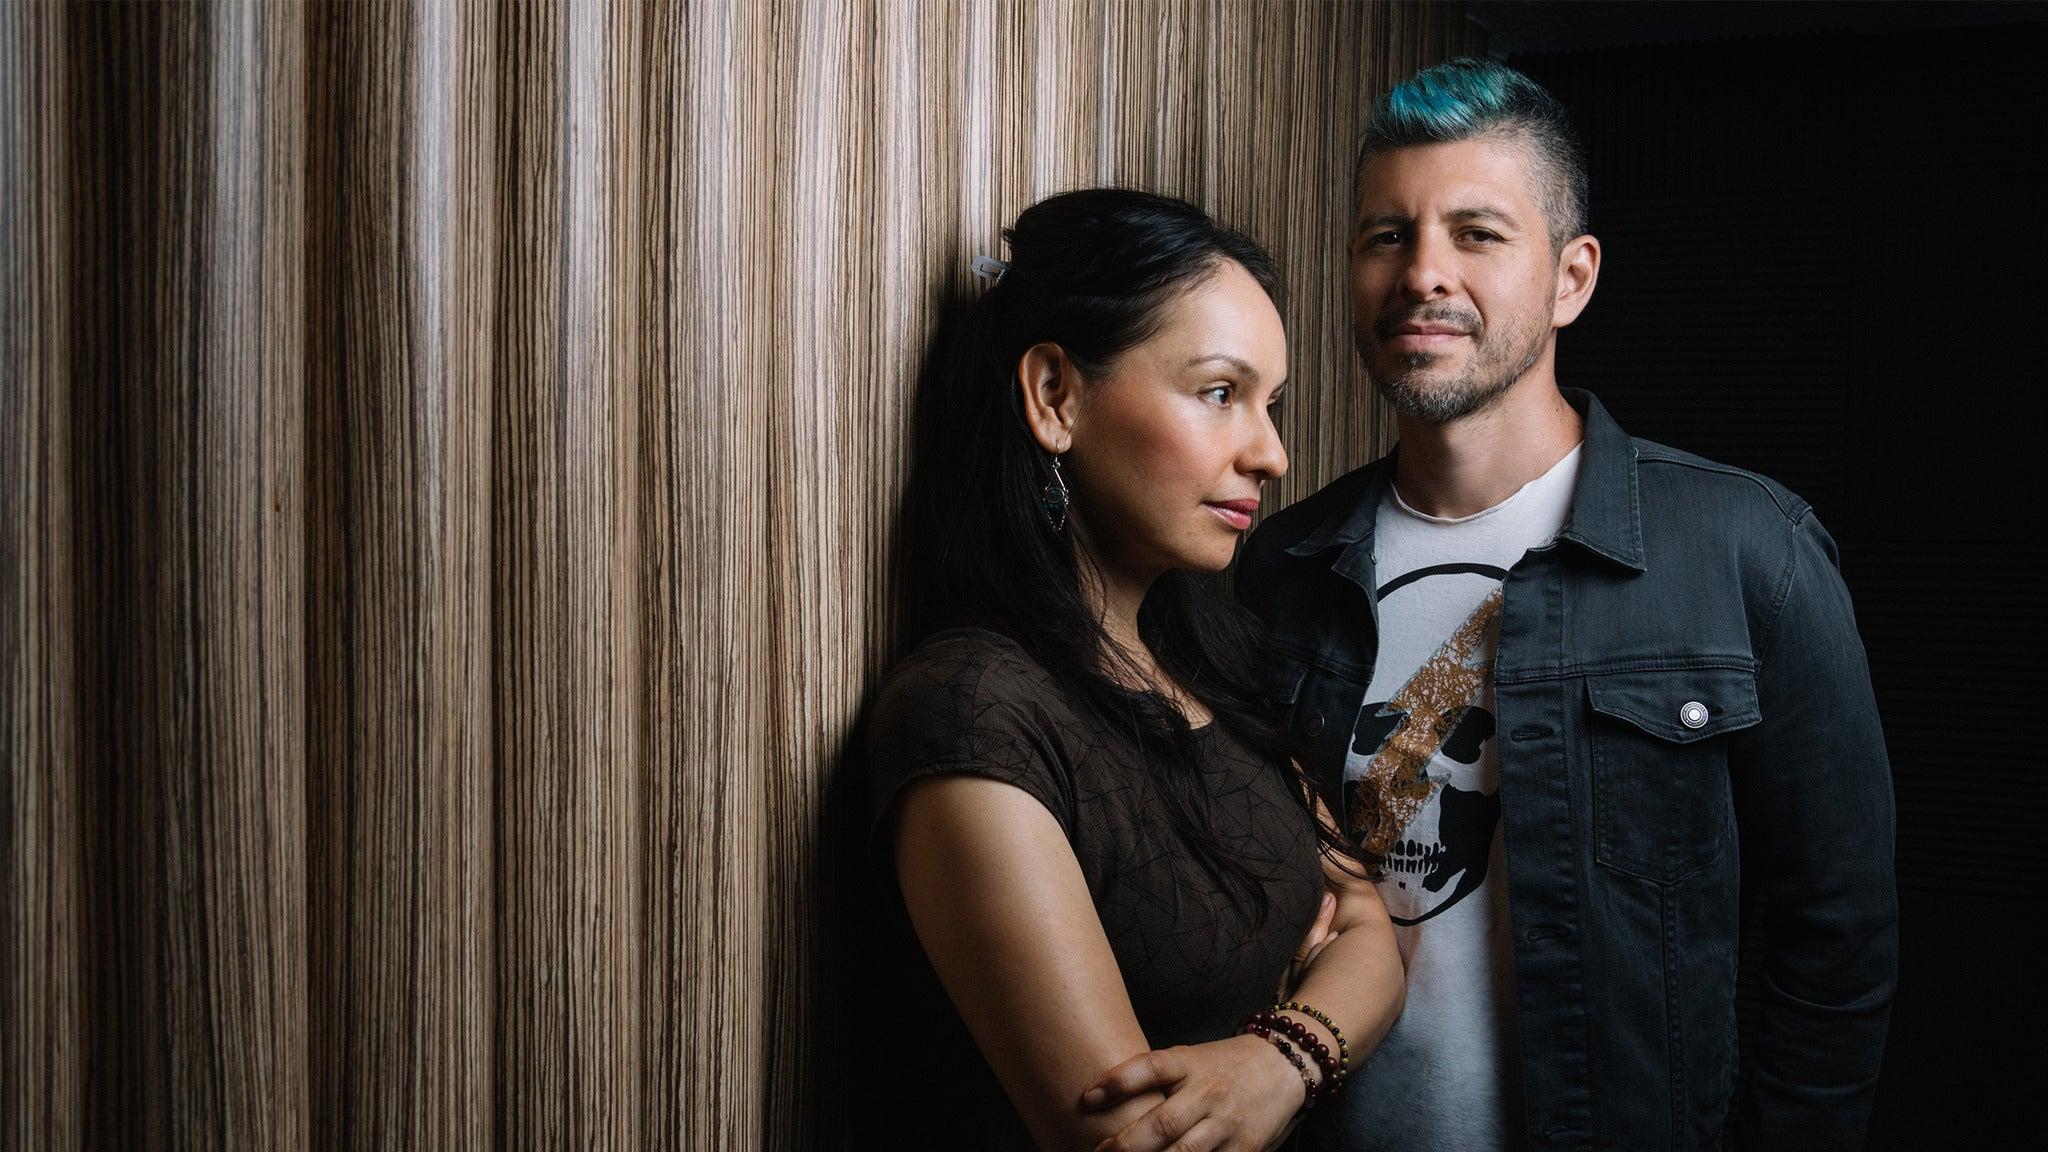 presale code for Rodrigo y Gabriela tickets in New York - NY (The Rooftop at Pier 17)